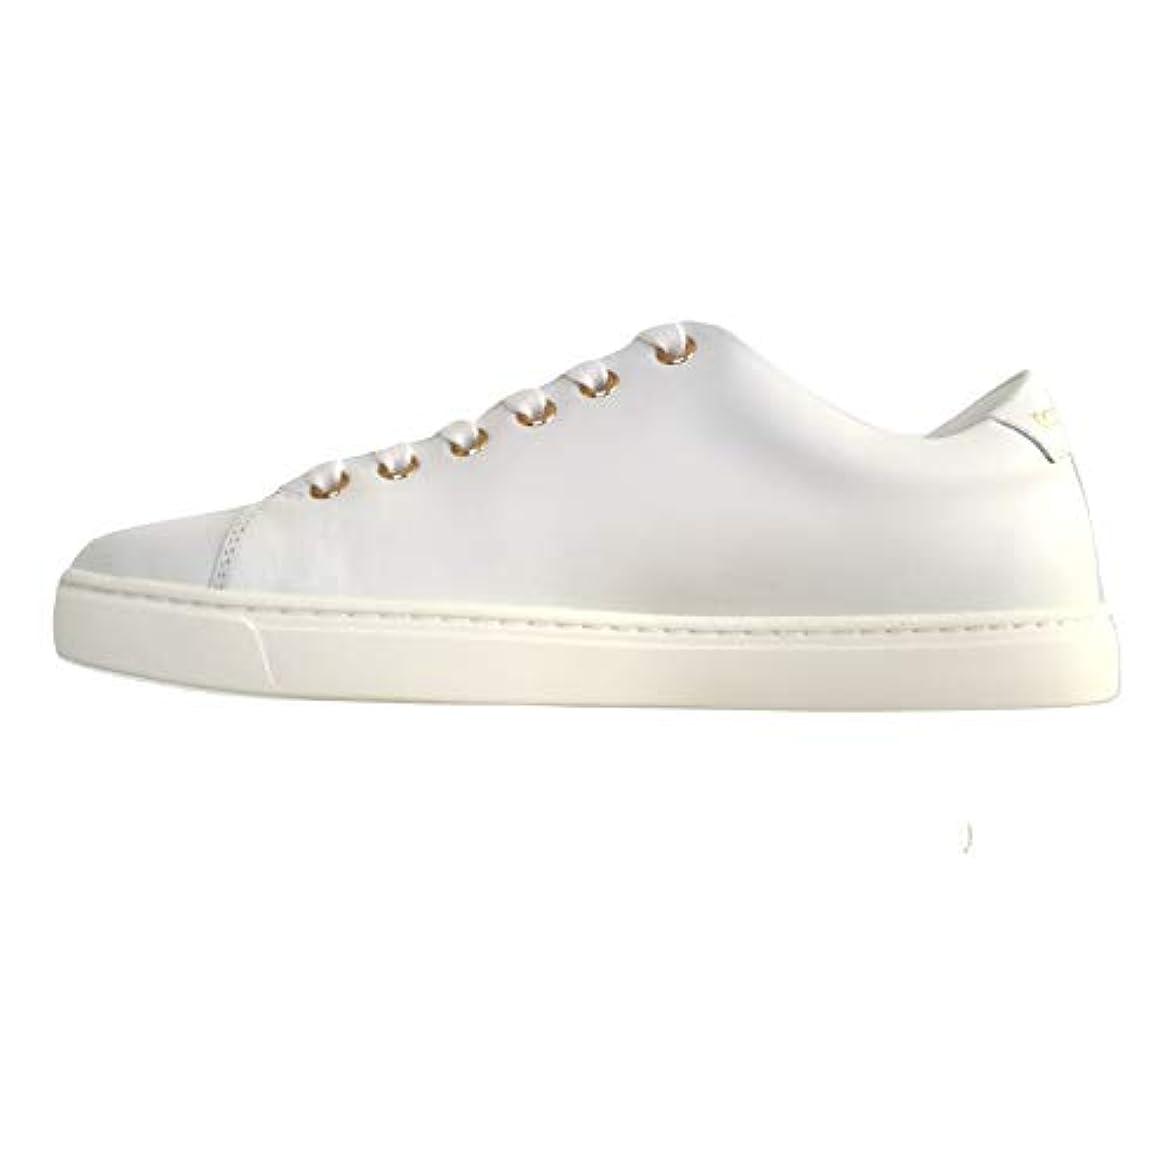 Dolce amp; Gabbana Scarpe Sneaker Portofino Donna Ck0167b529480001